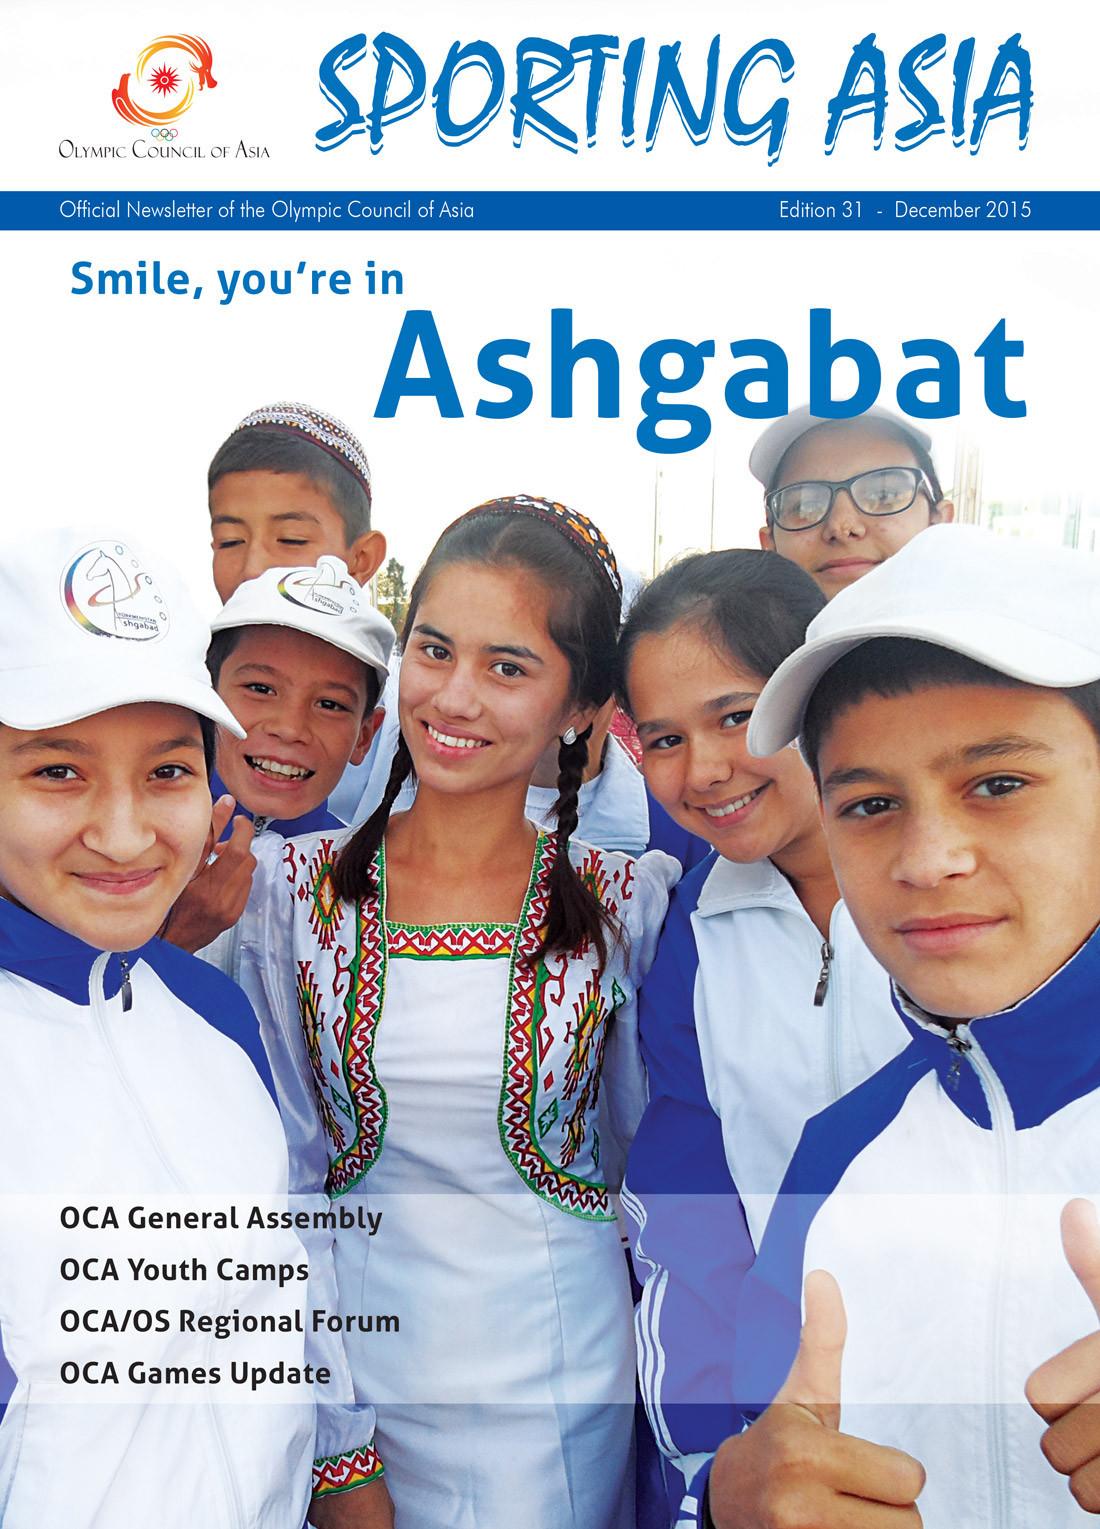 Sporting Asia - Edition 31 - DEC 2015